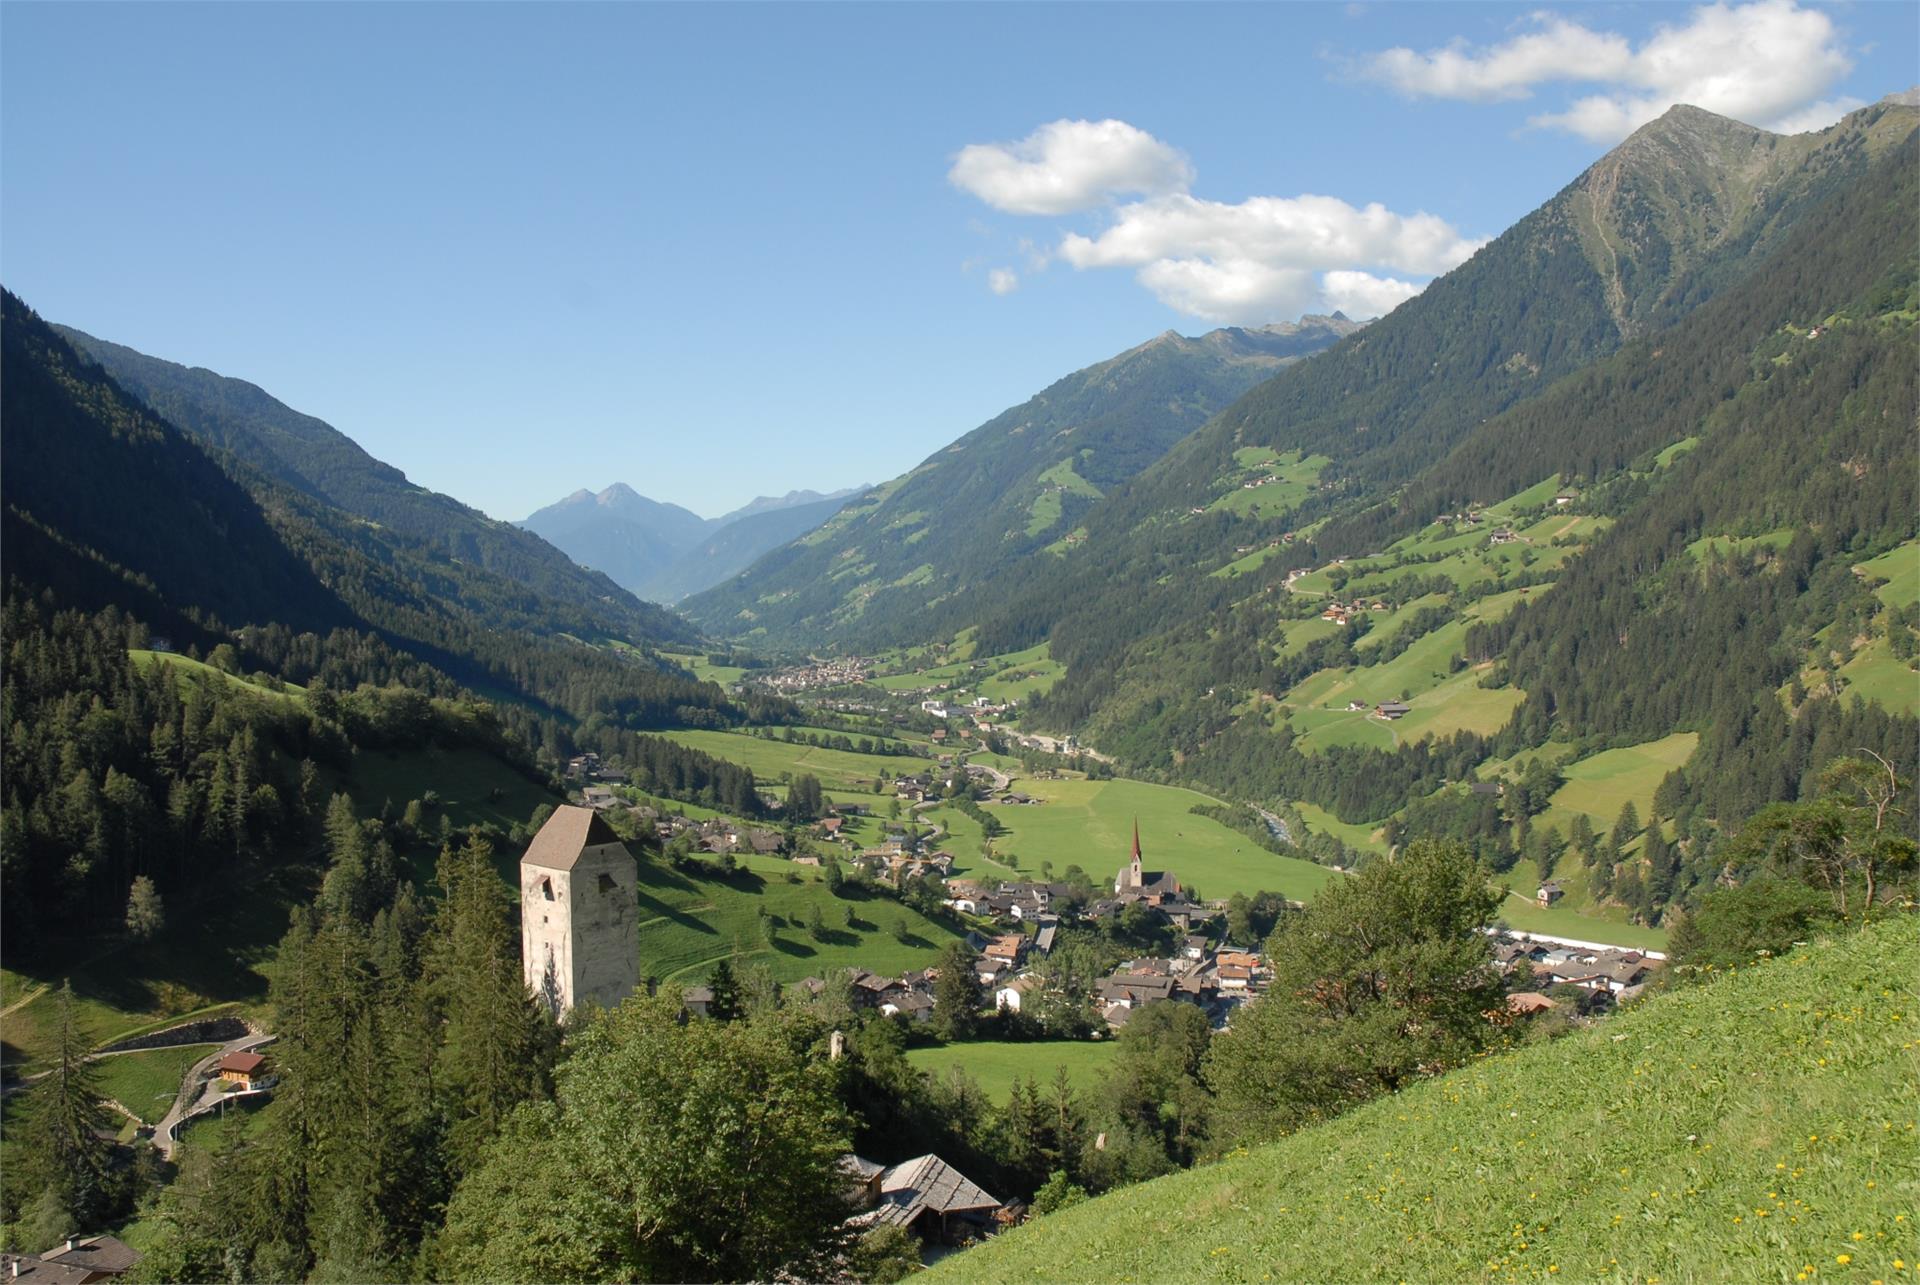 Jaufenburg in S. Leoanardo / St. Leonhard